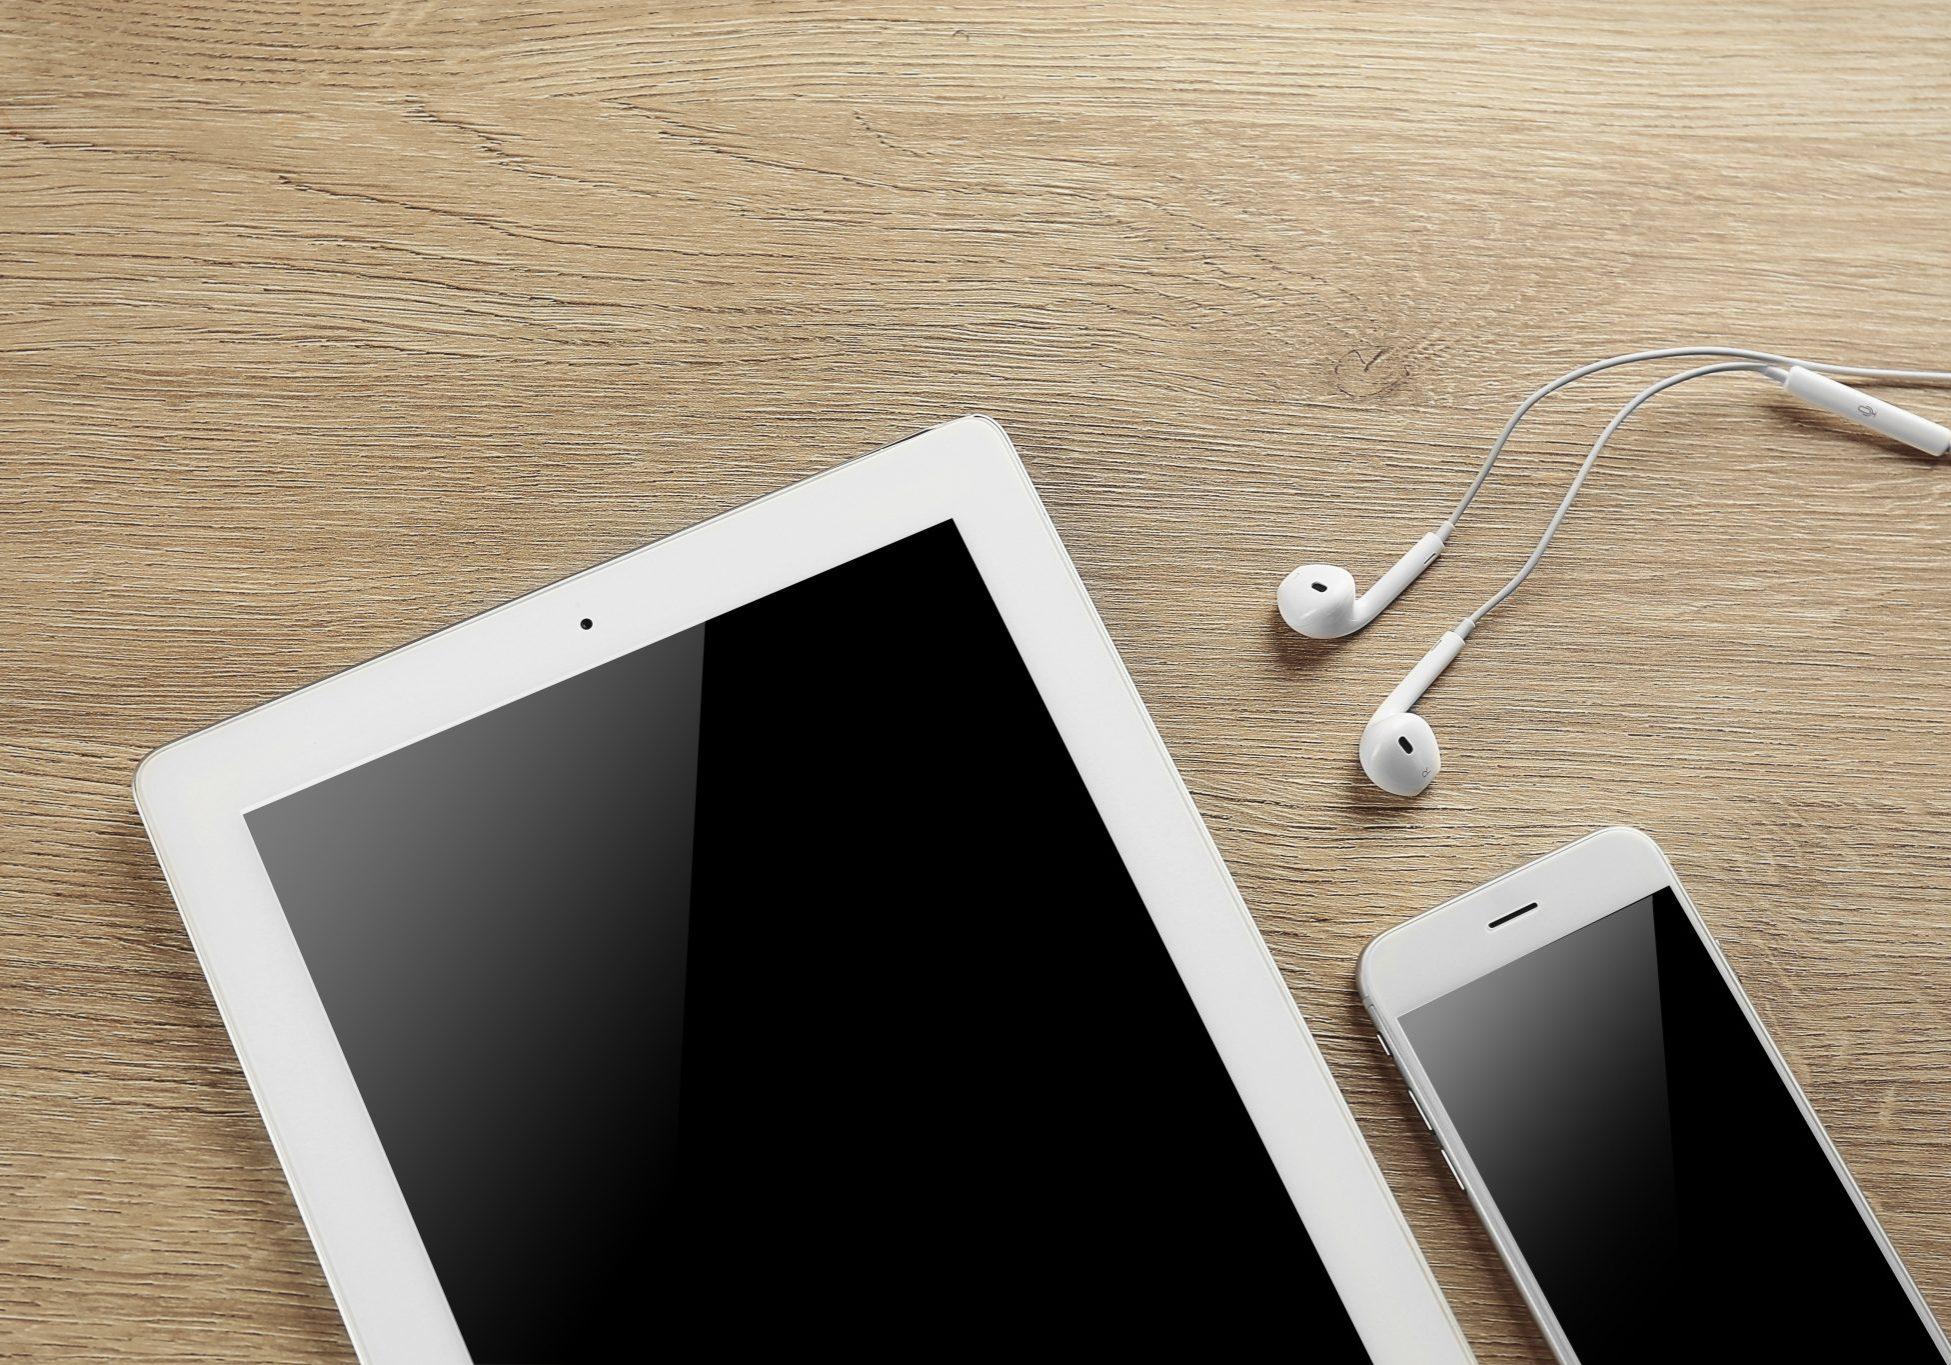 bigstock-Tablet-smartphone-and-earphon-150298394